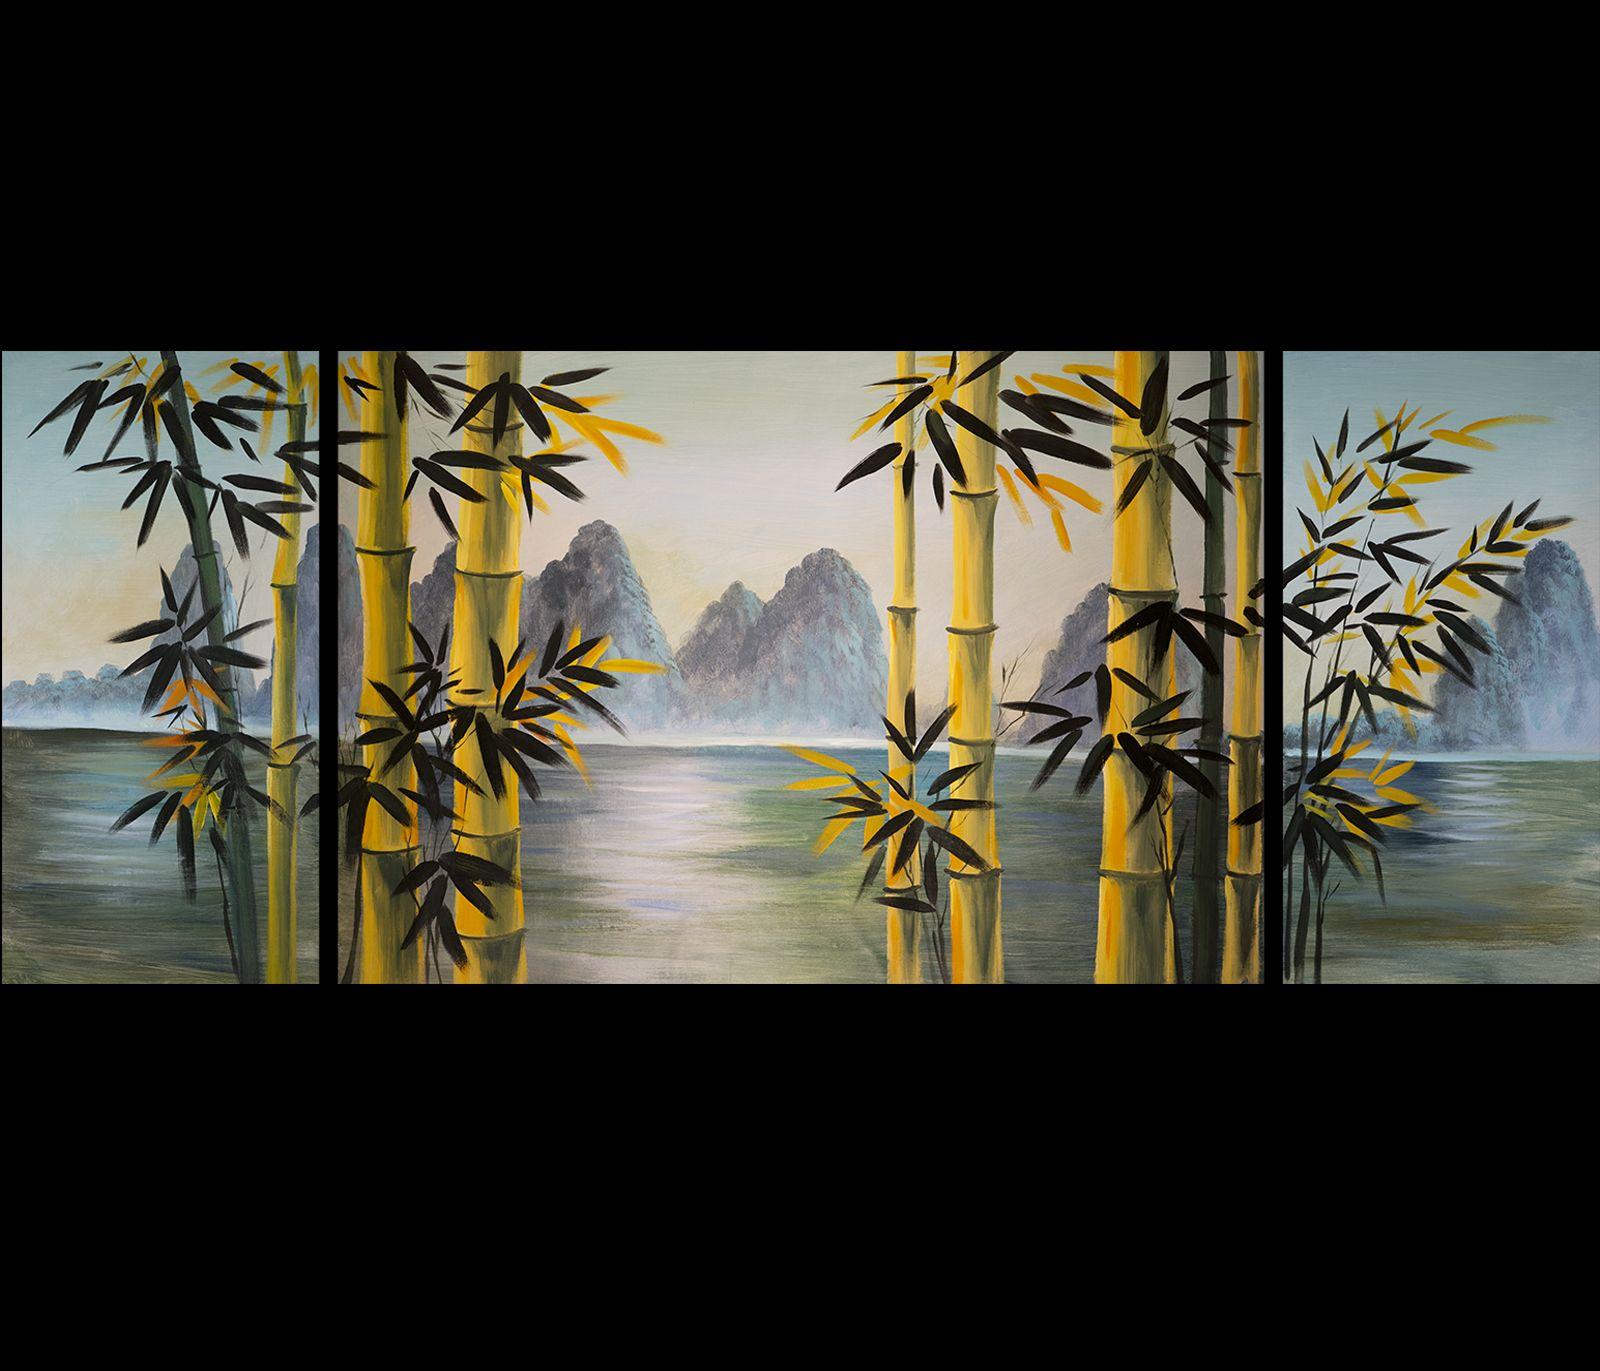 Wall Art Painting Of Bamboo